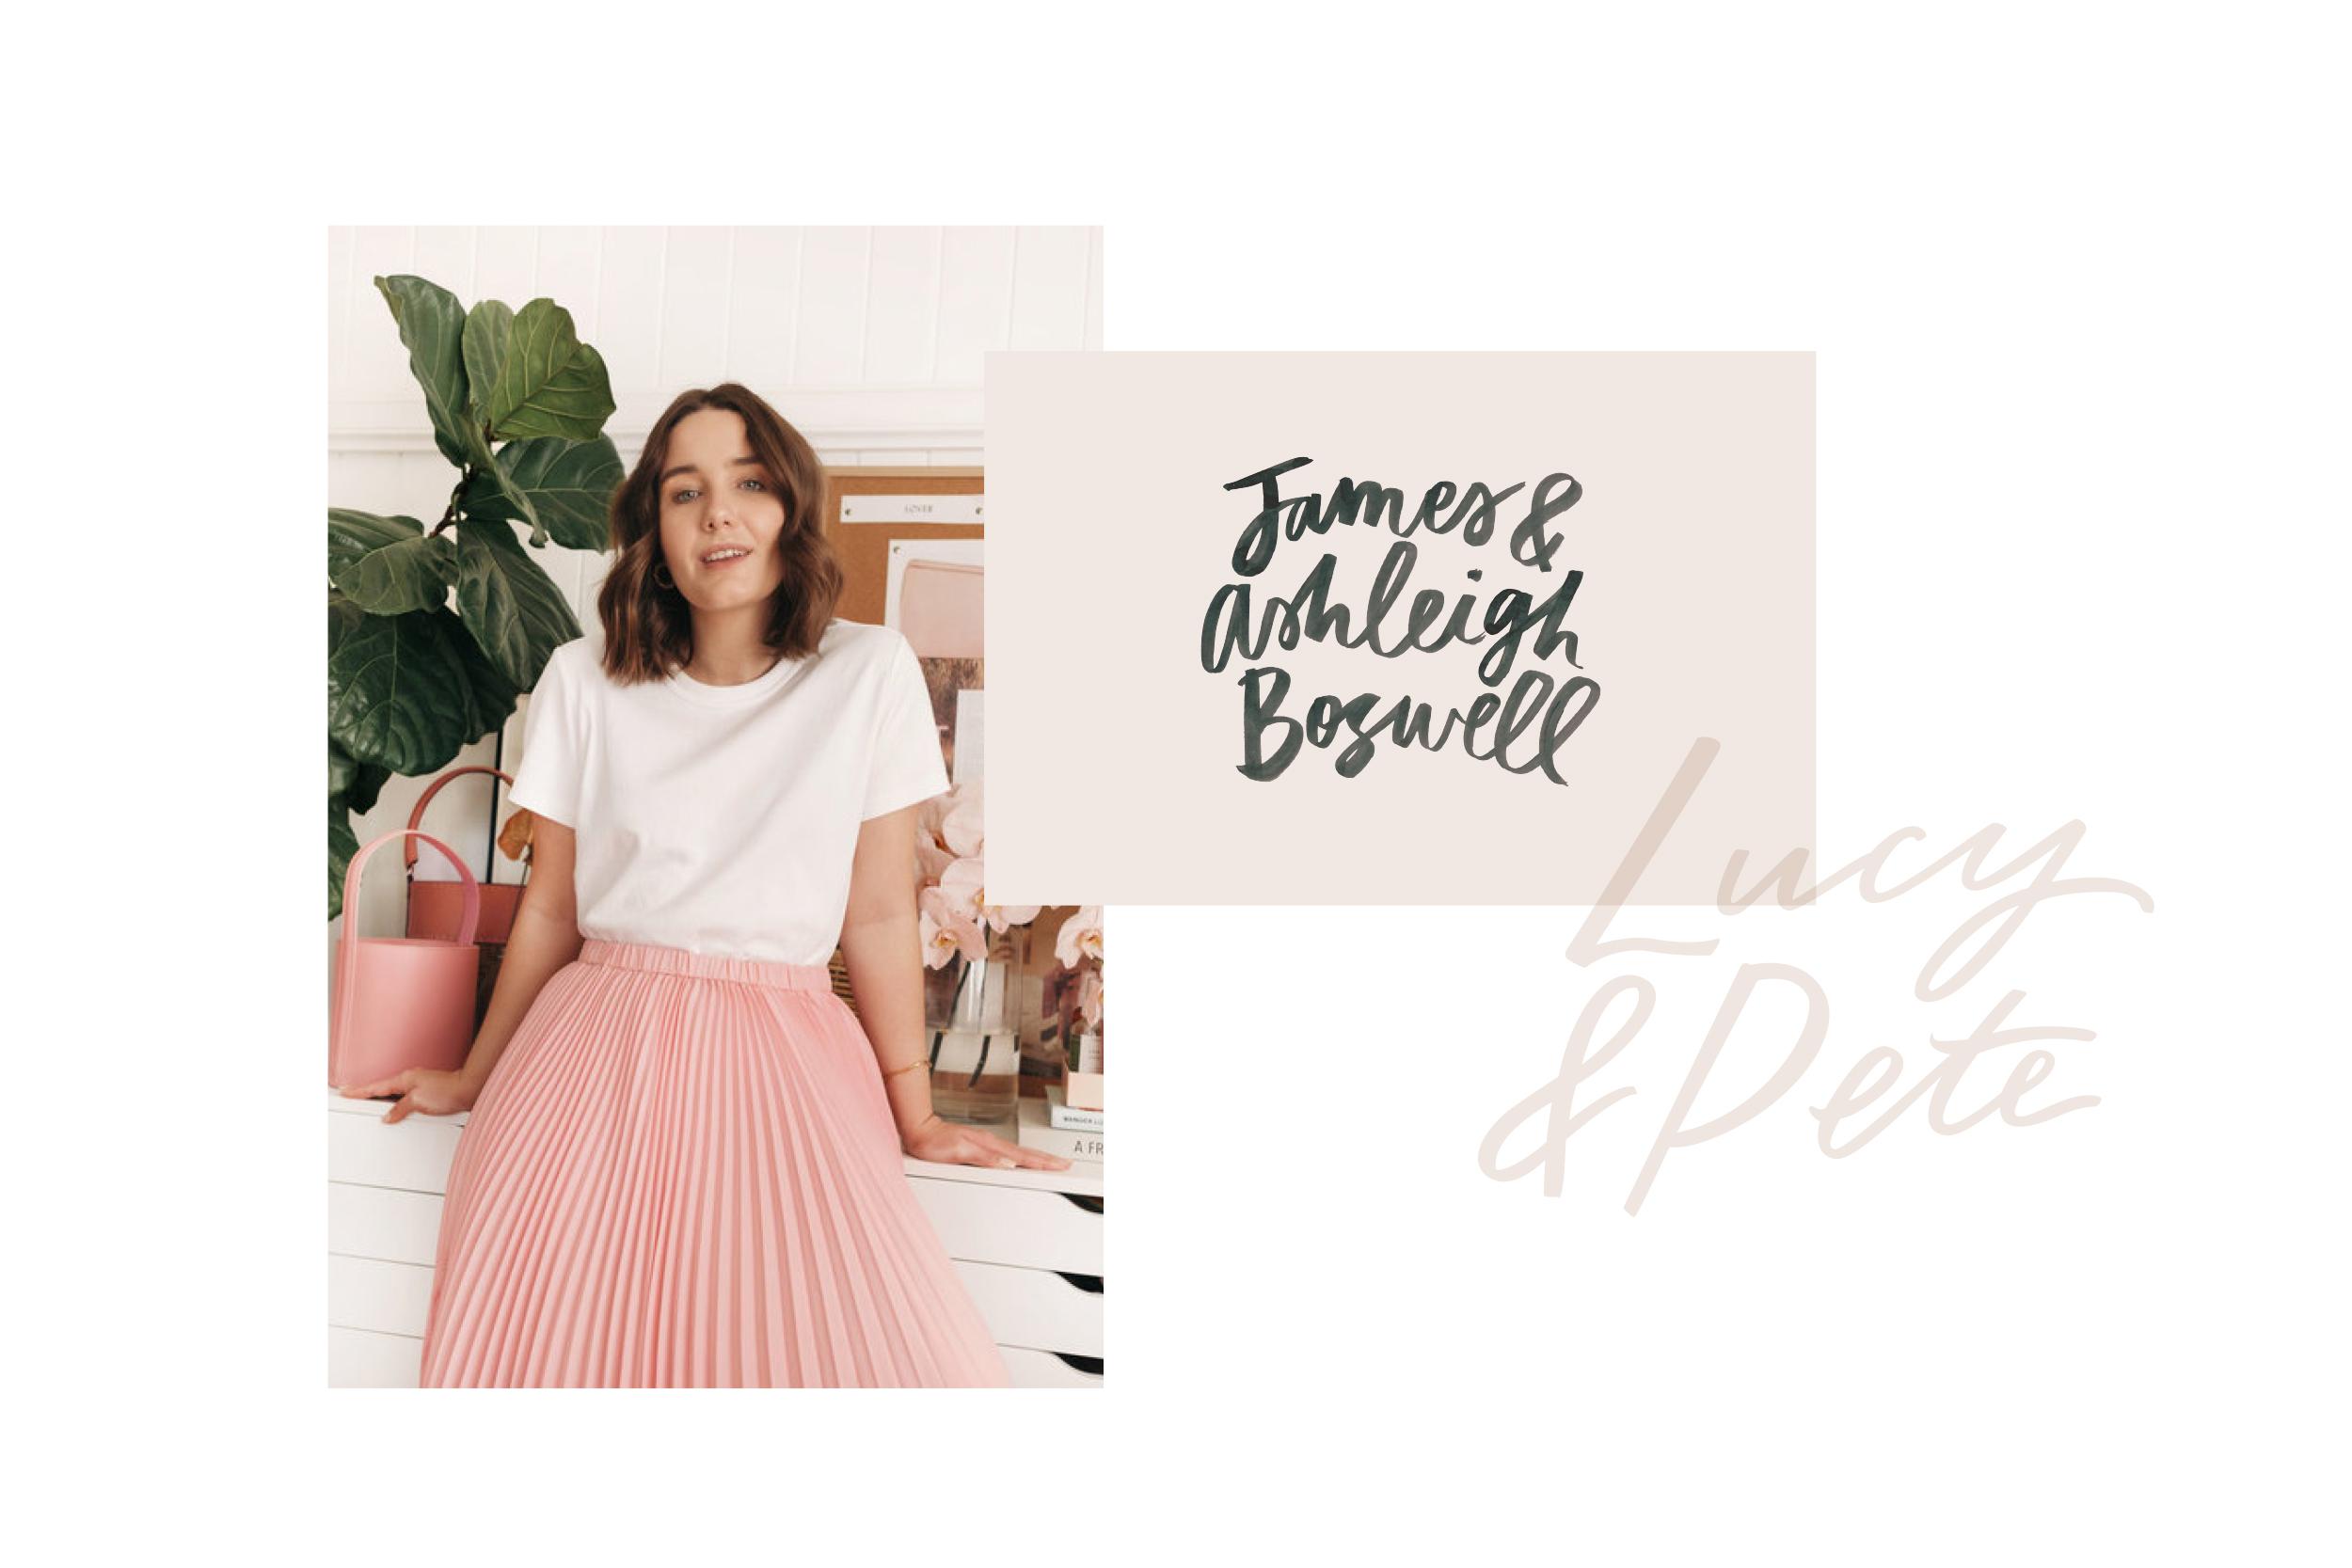 Jasmine Dowling Collaboration